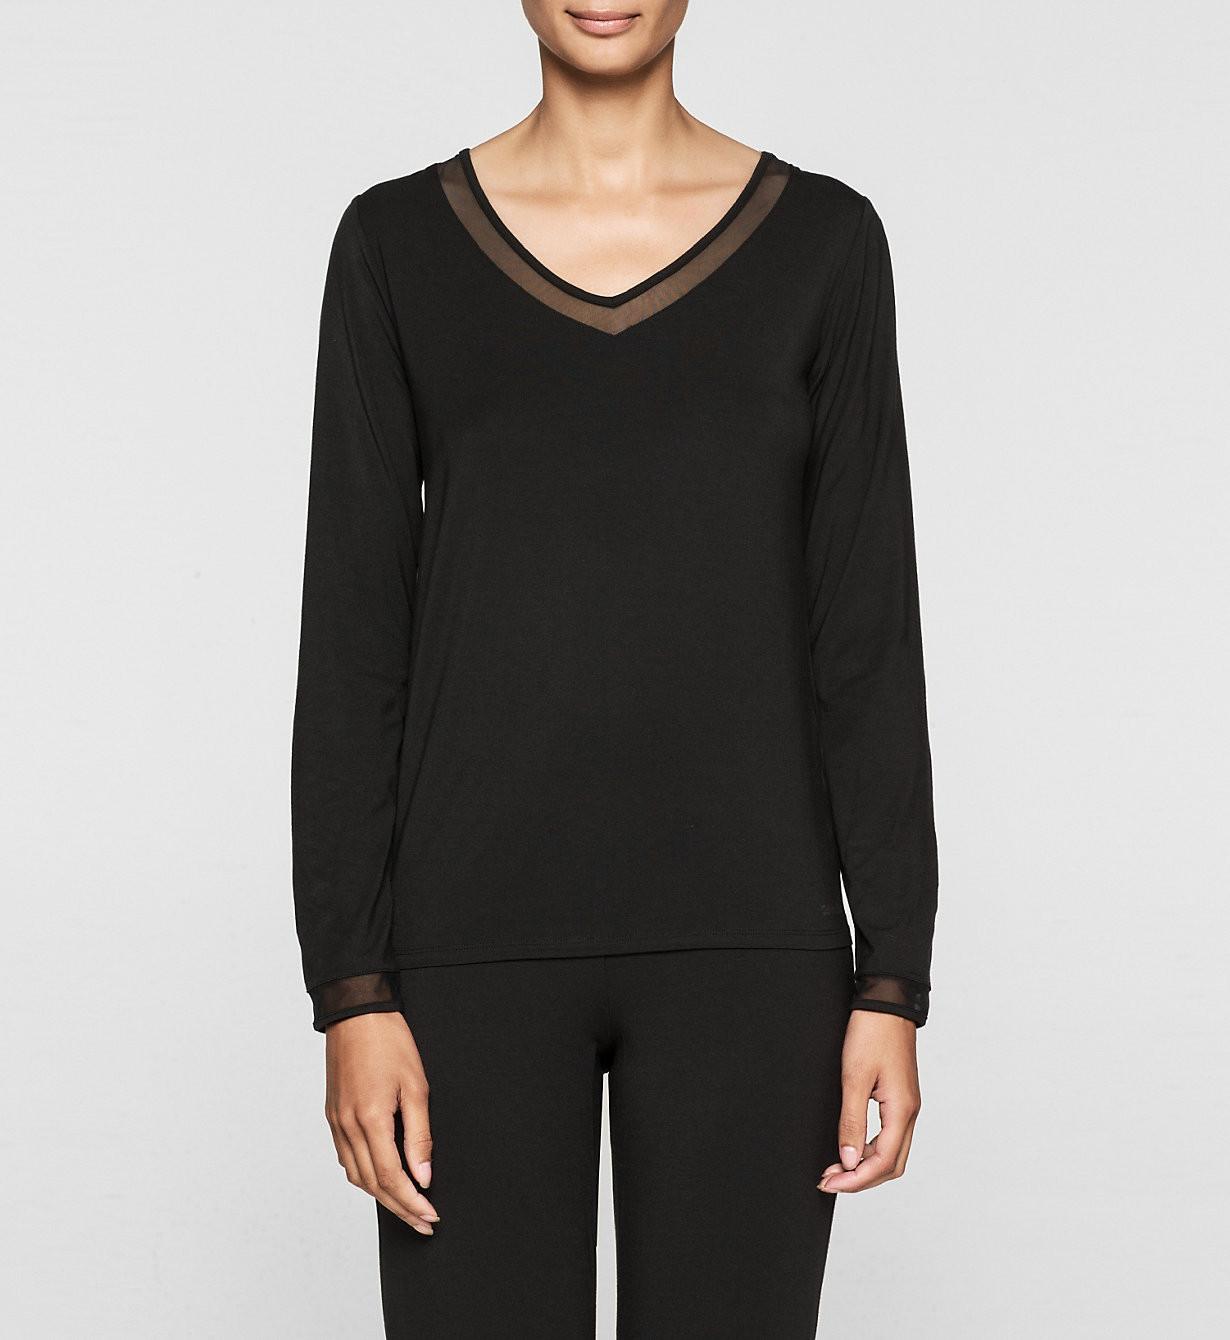 Dámské tričko QS5306E - Calvin Klein fialová L